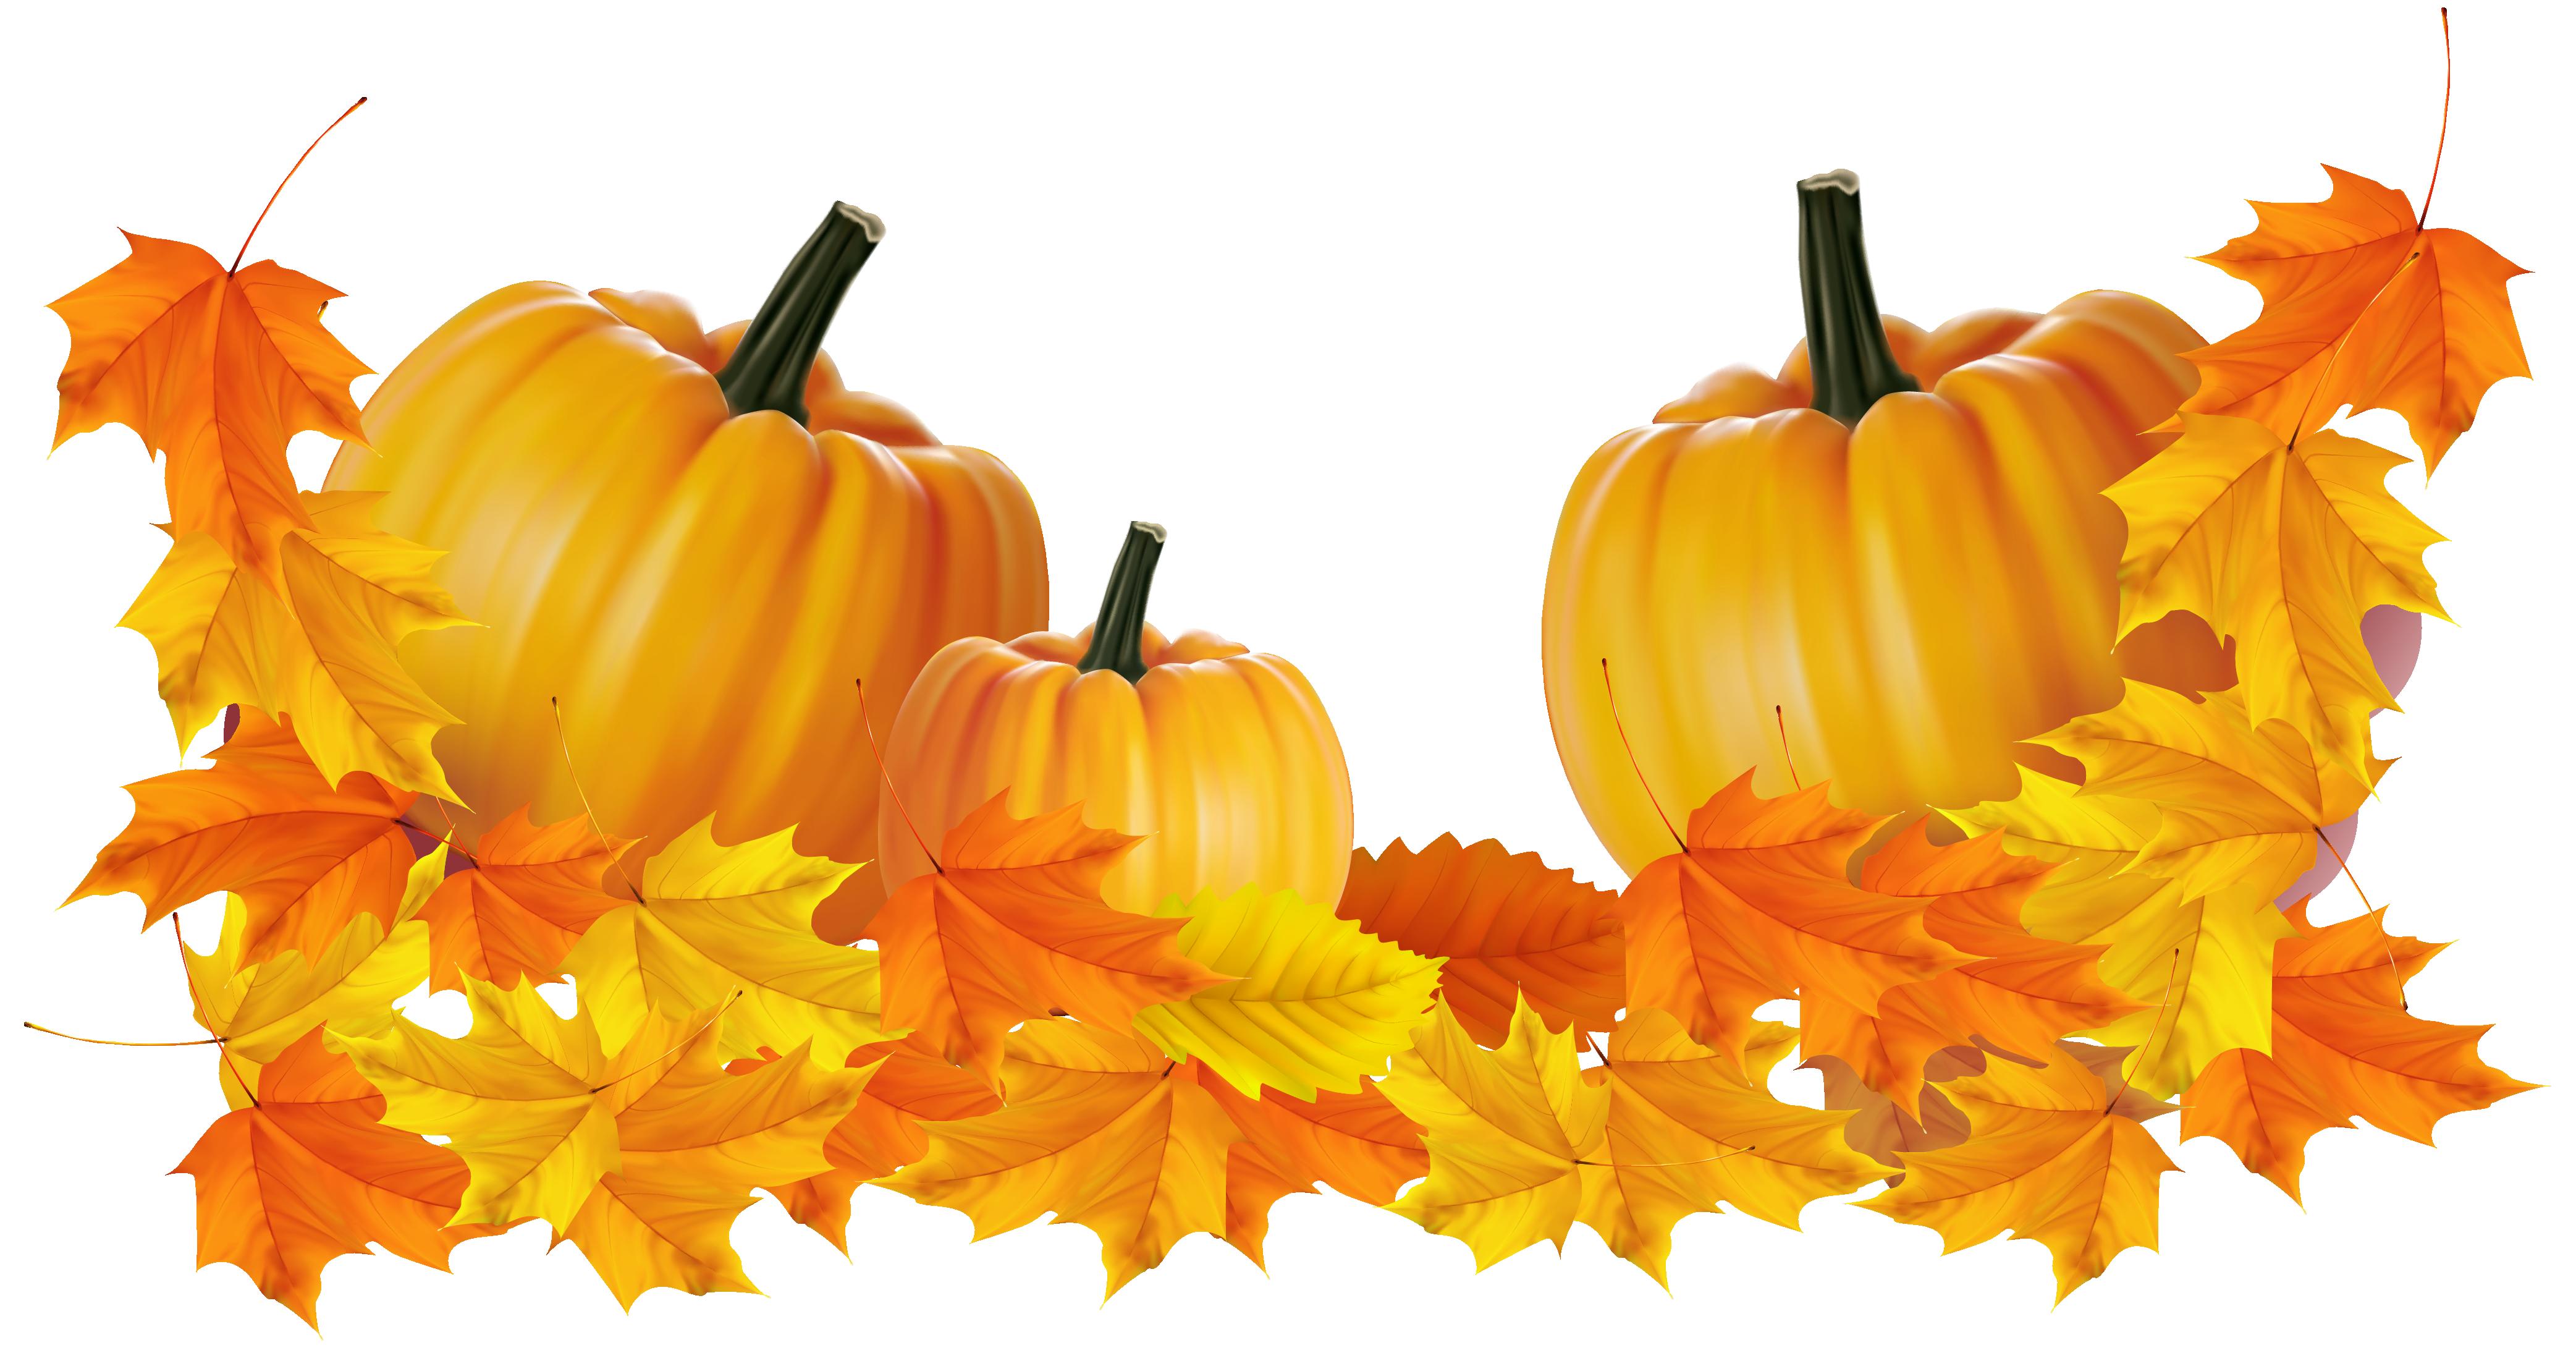 svg transparent library Transparent Thanksgiving Pumpkin Decor Clipart Png